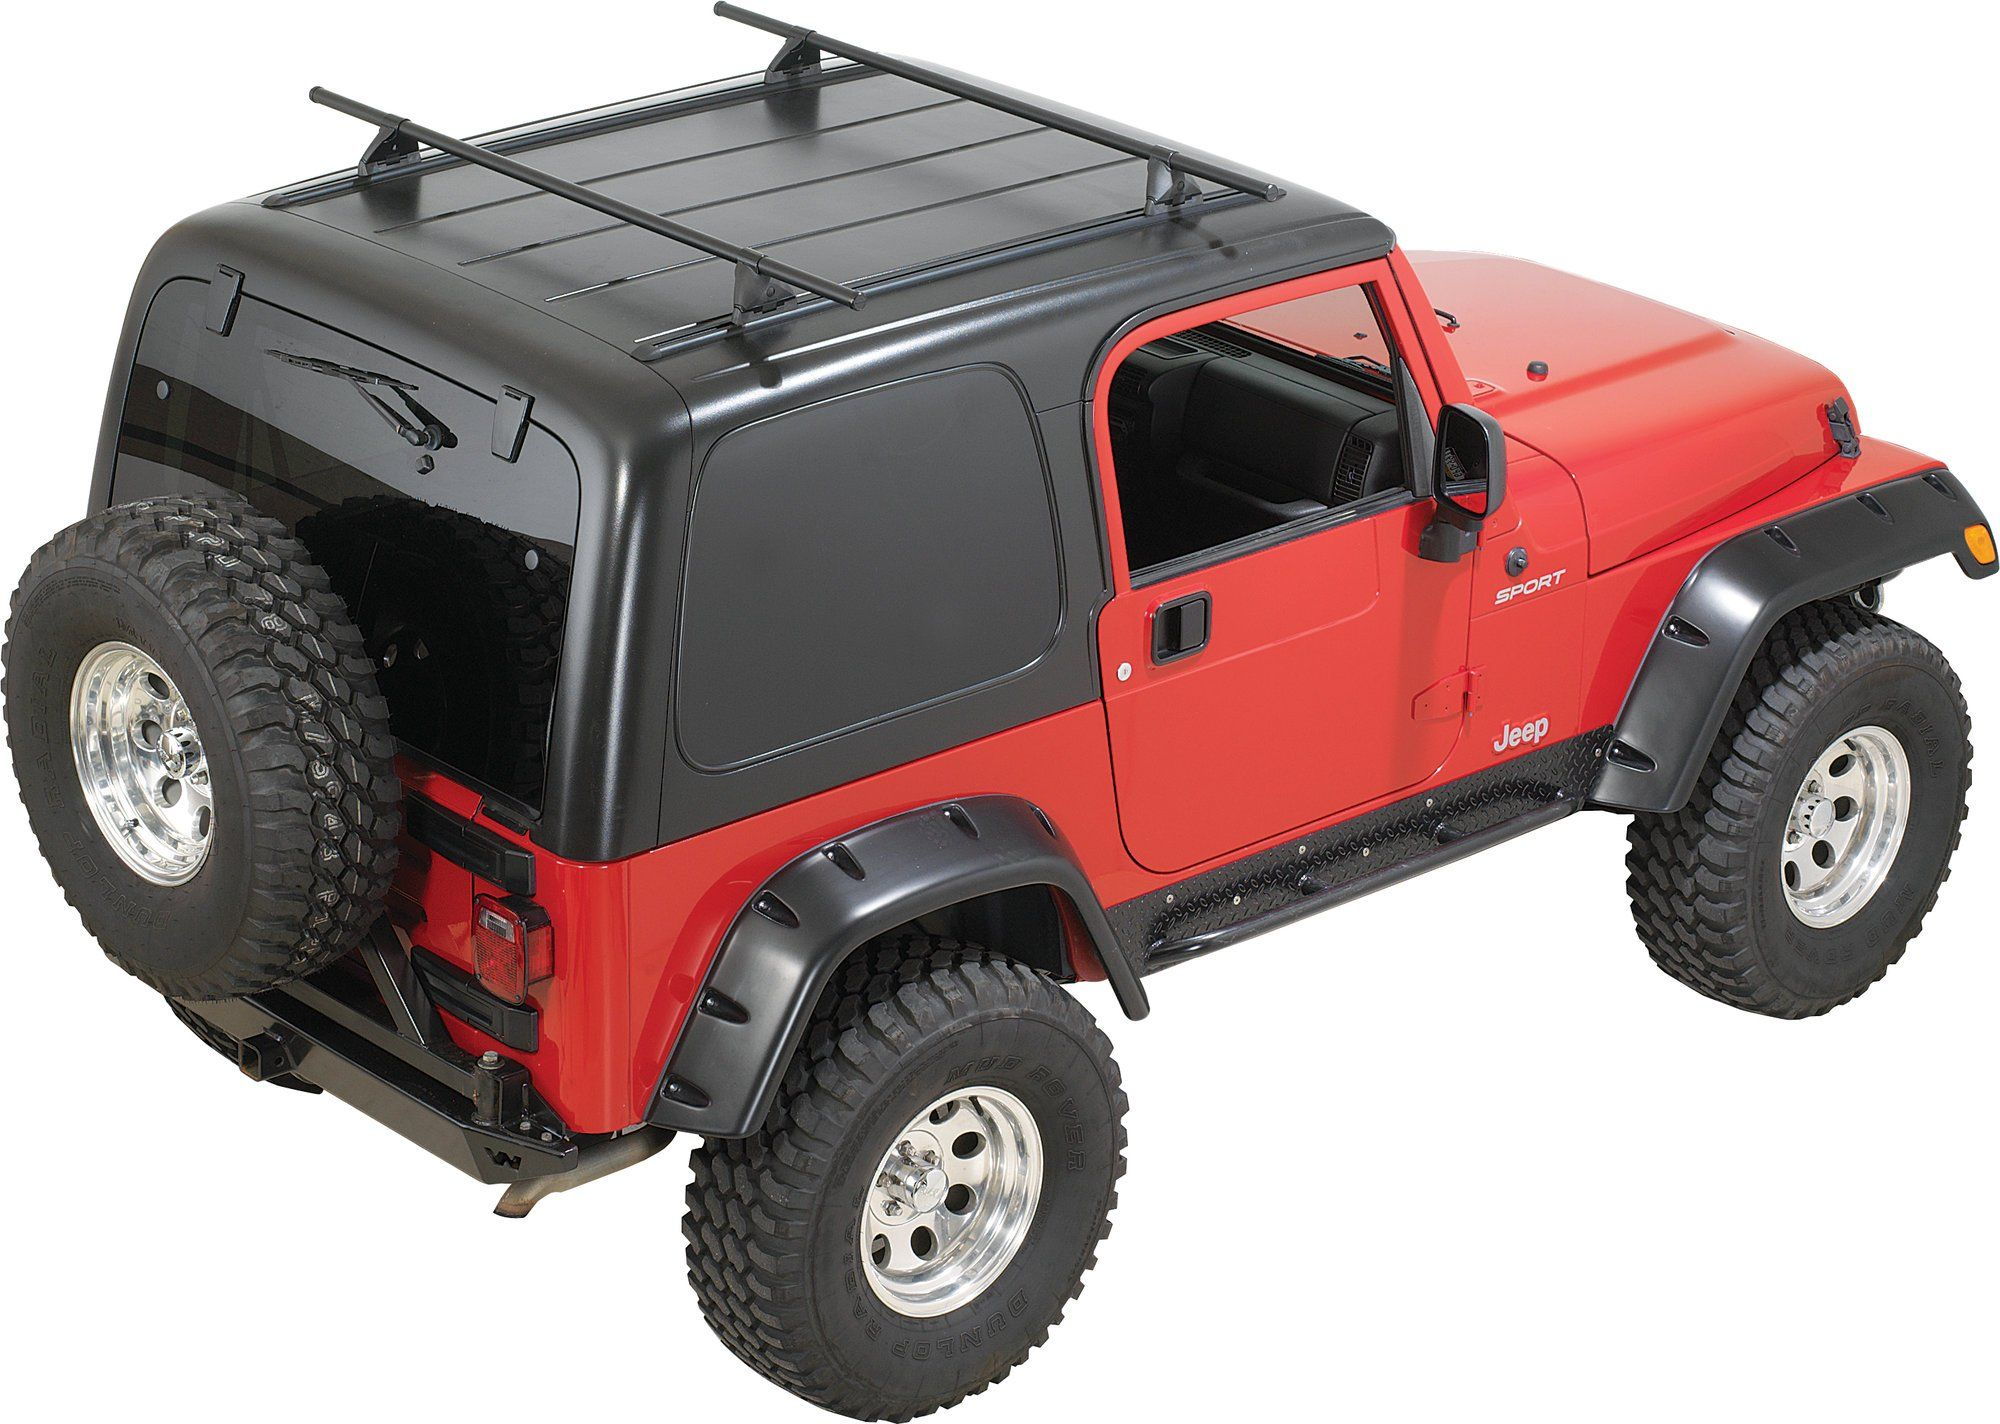 Jeep Hardtop Roof Rack In 2020 Jeep Wrangler Yj Jeep Wrangler Jeep Wrangler Hard Top